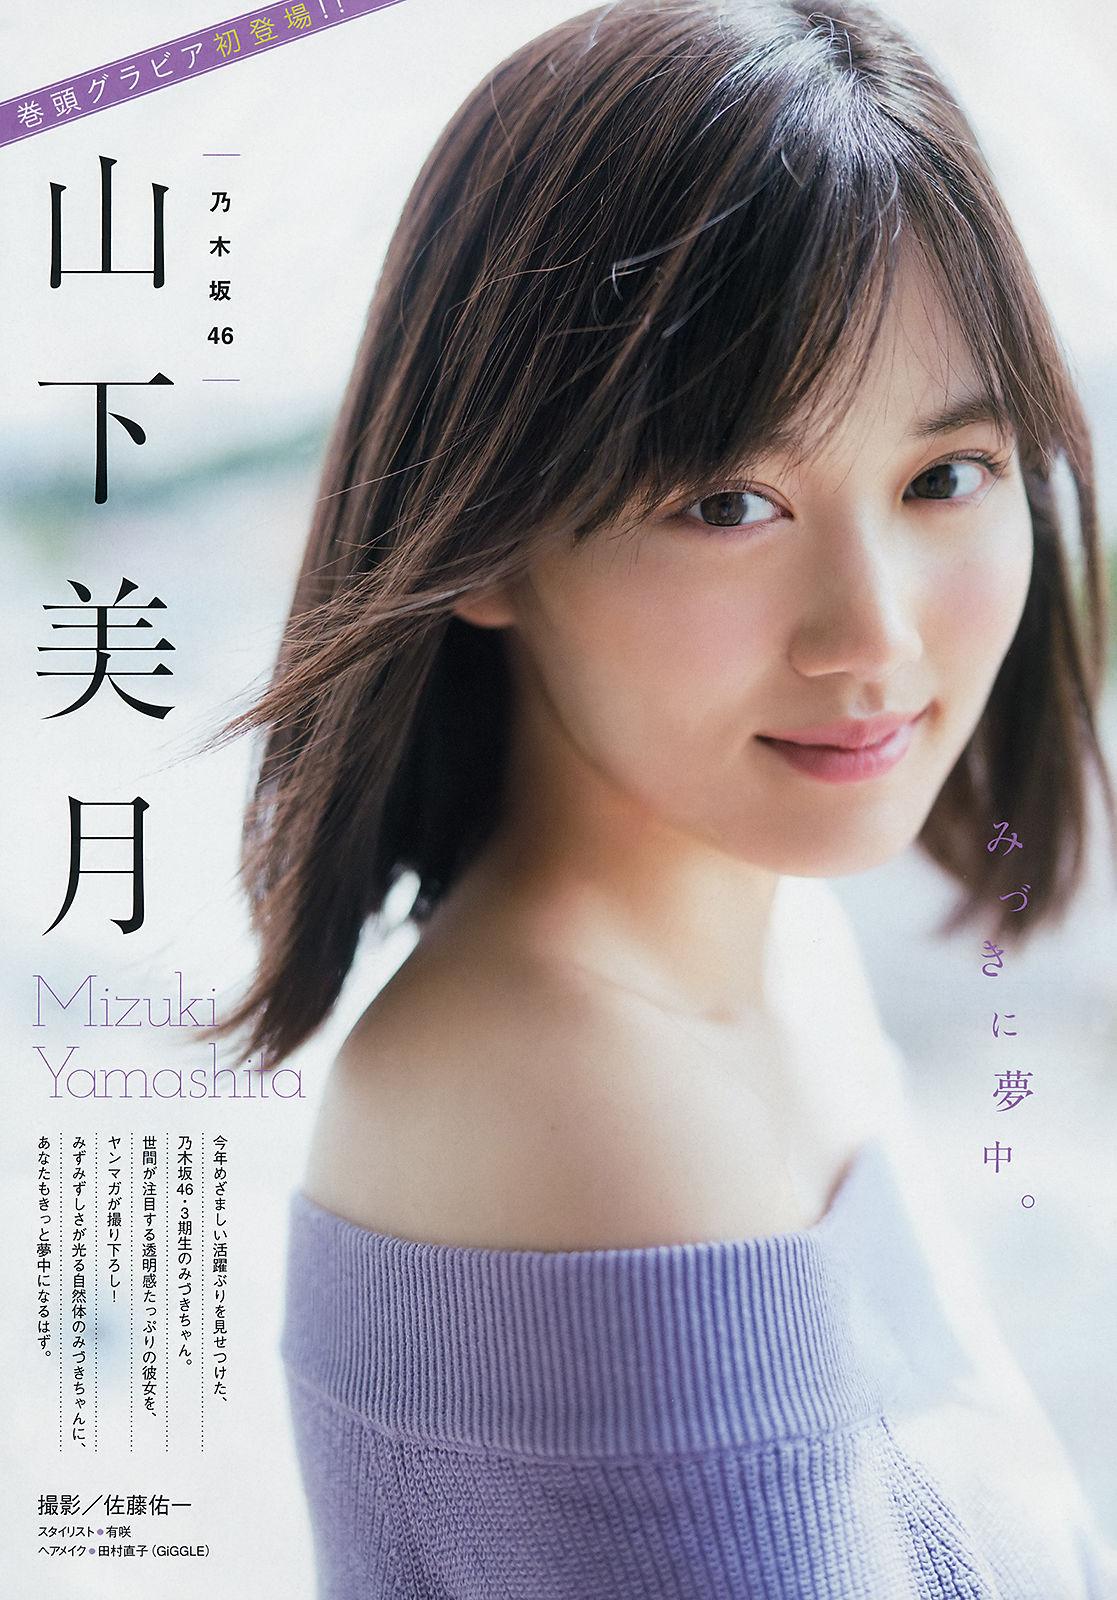 VOL.518 [Young Magazine]清纯正妹:山下美月超高清写真套图(12P)